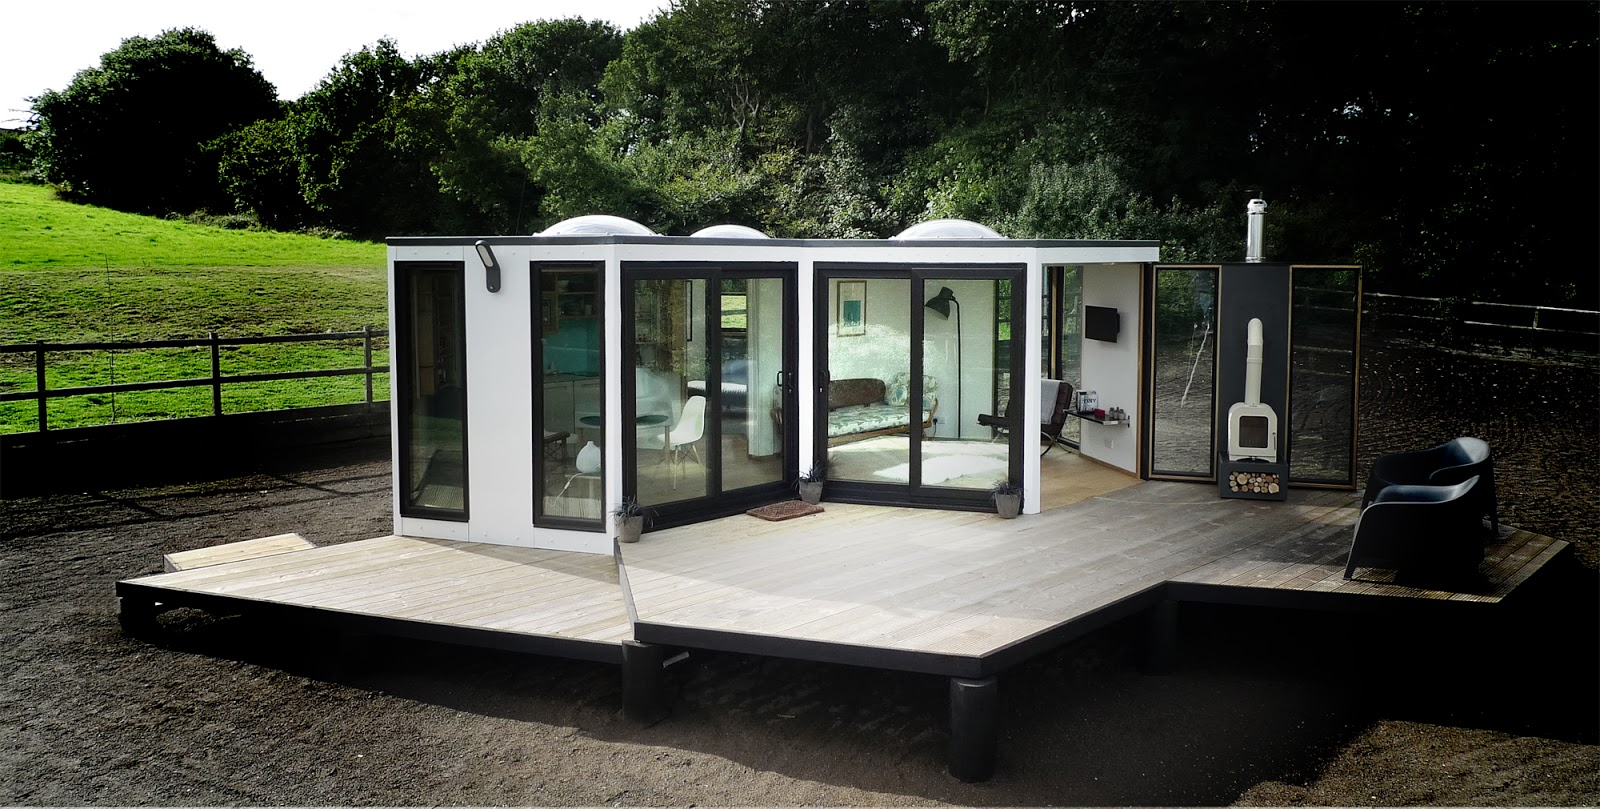 Roj Fashion Lifestyle The 39 Hive Haus 39 Modular